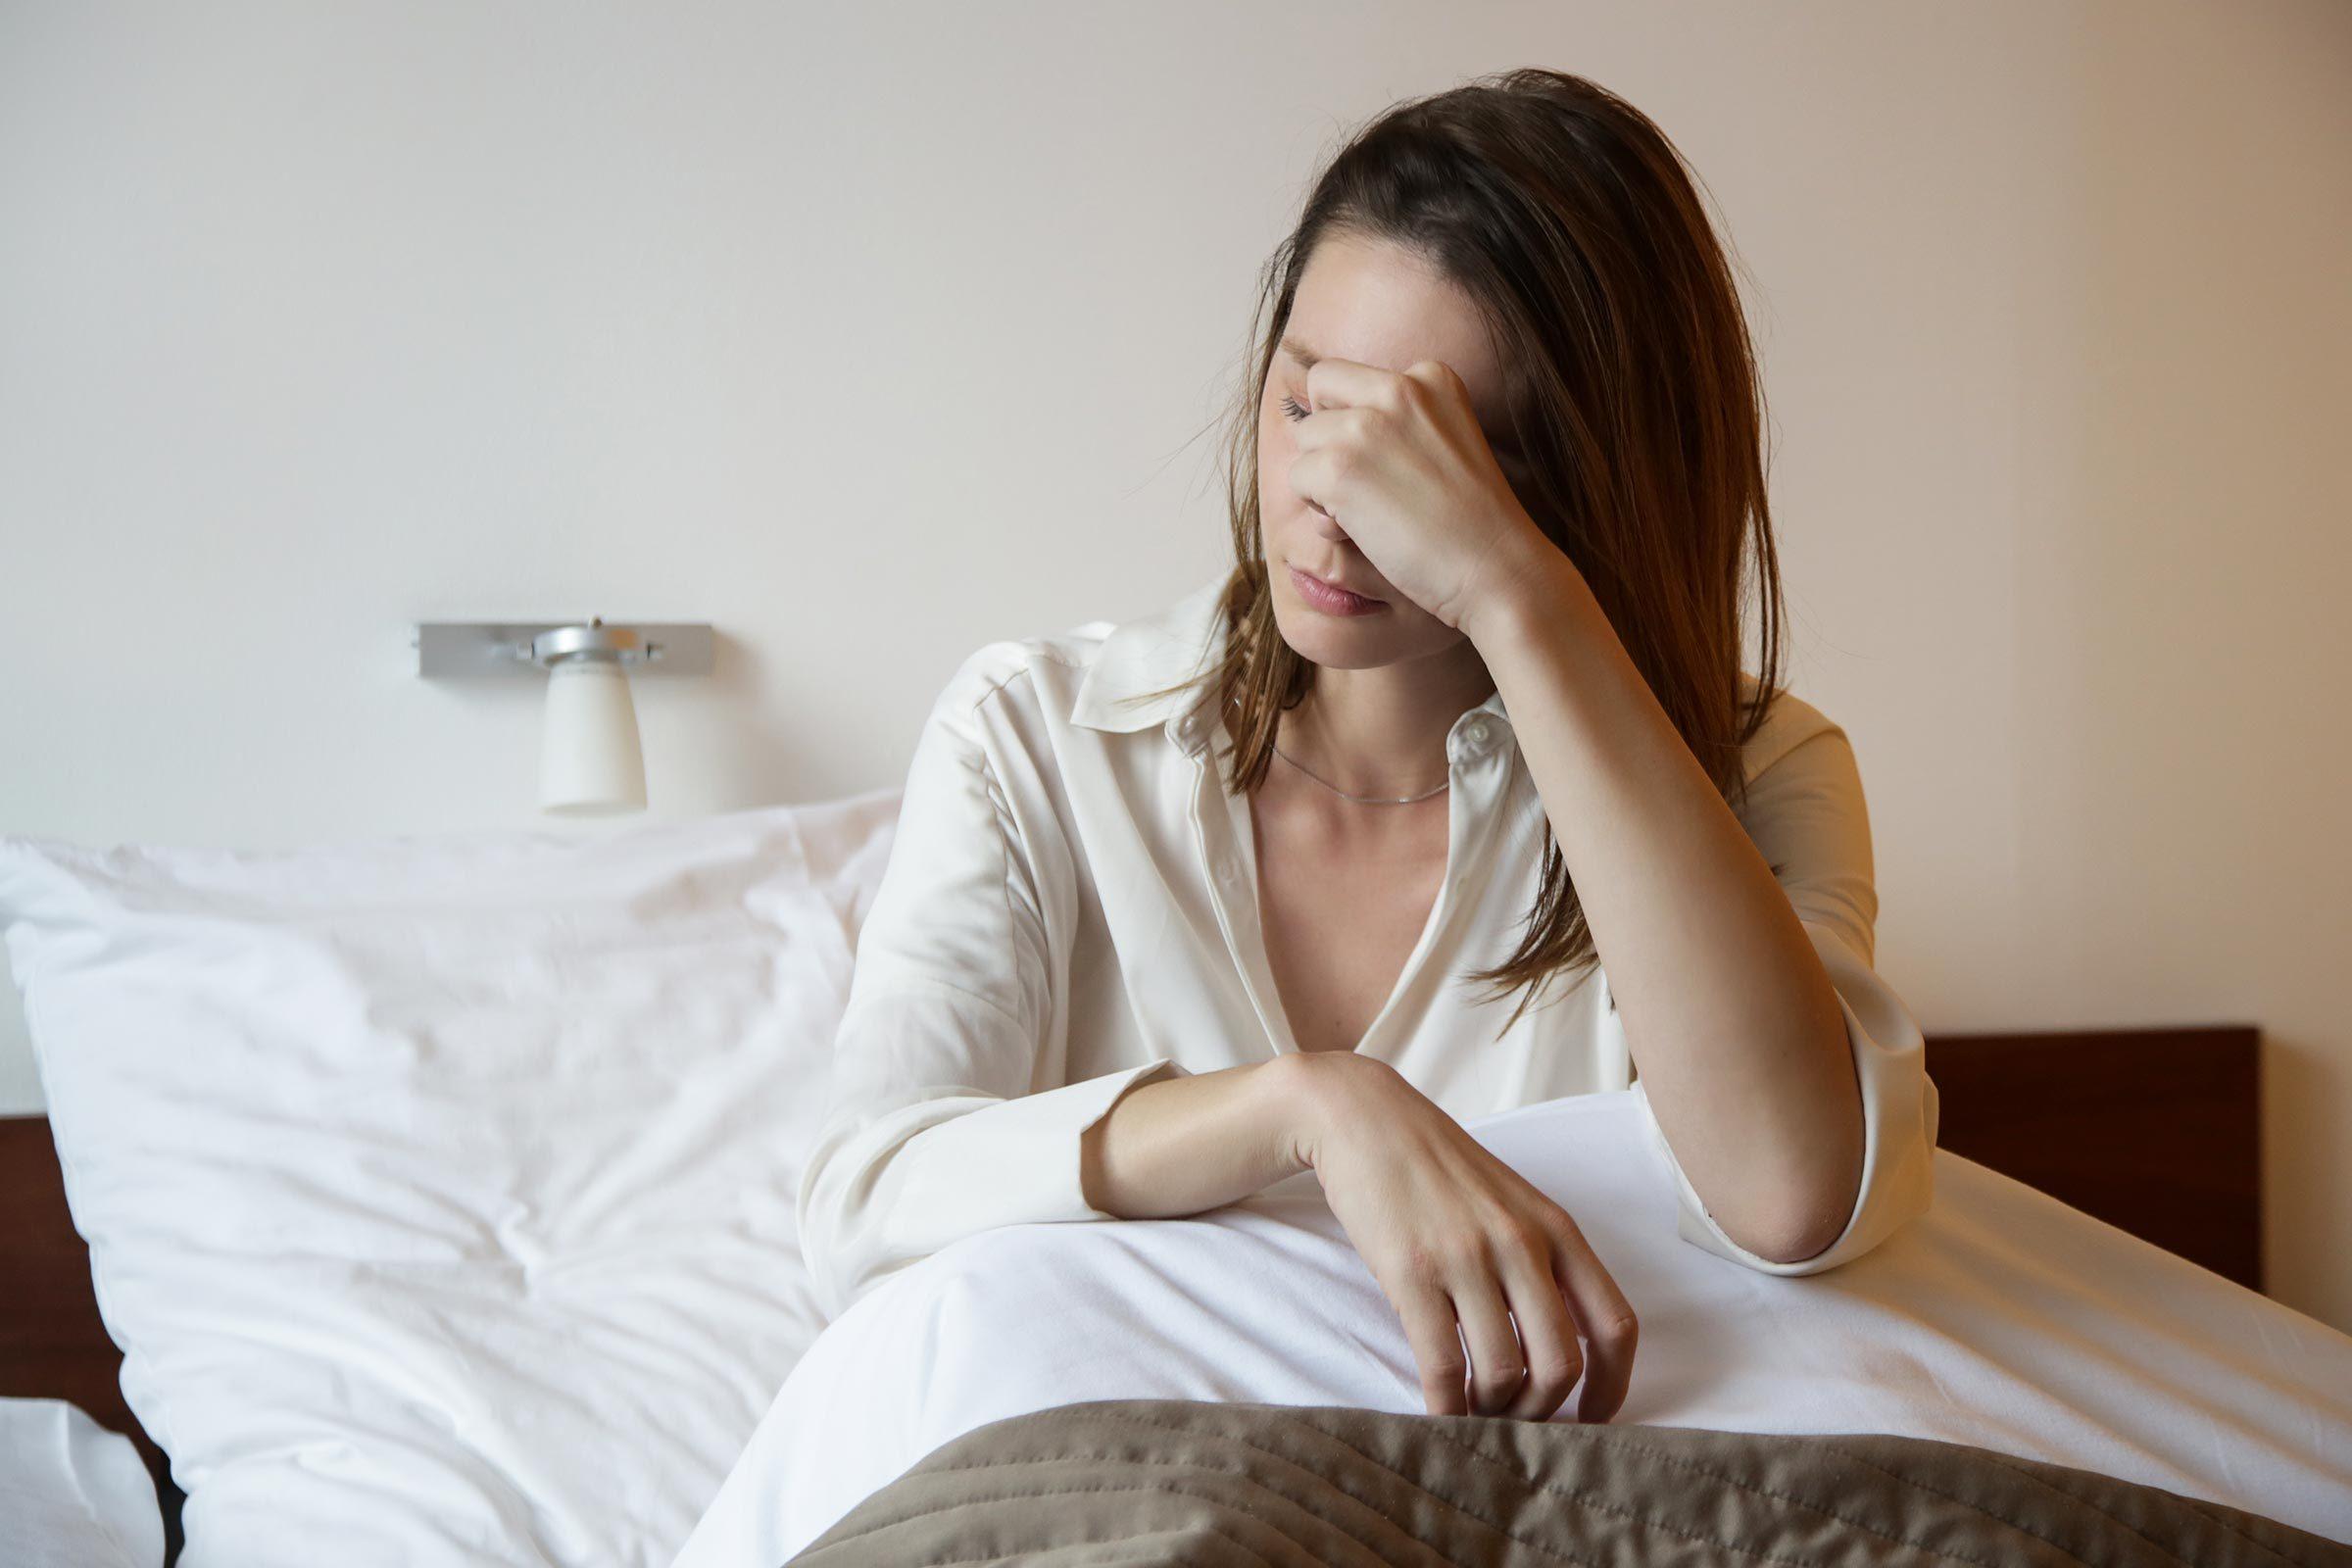 12 Things That Happen to Your Body When You Take Melatonin